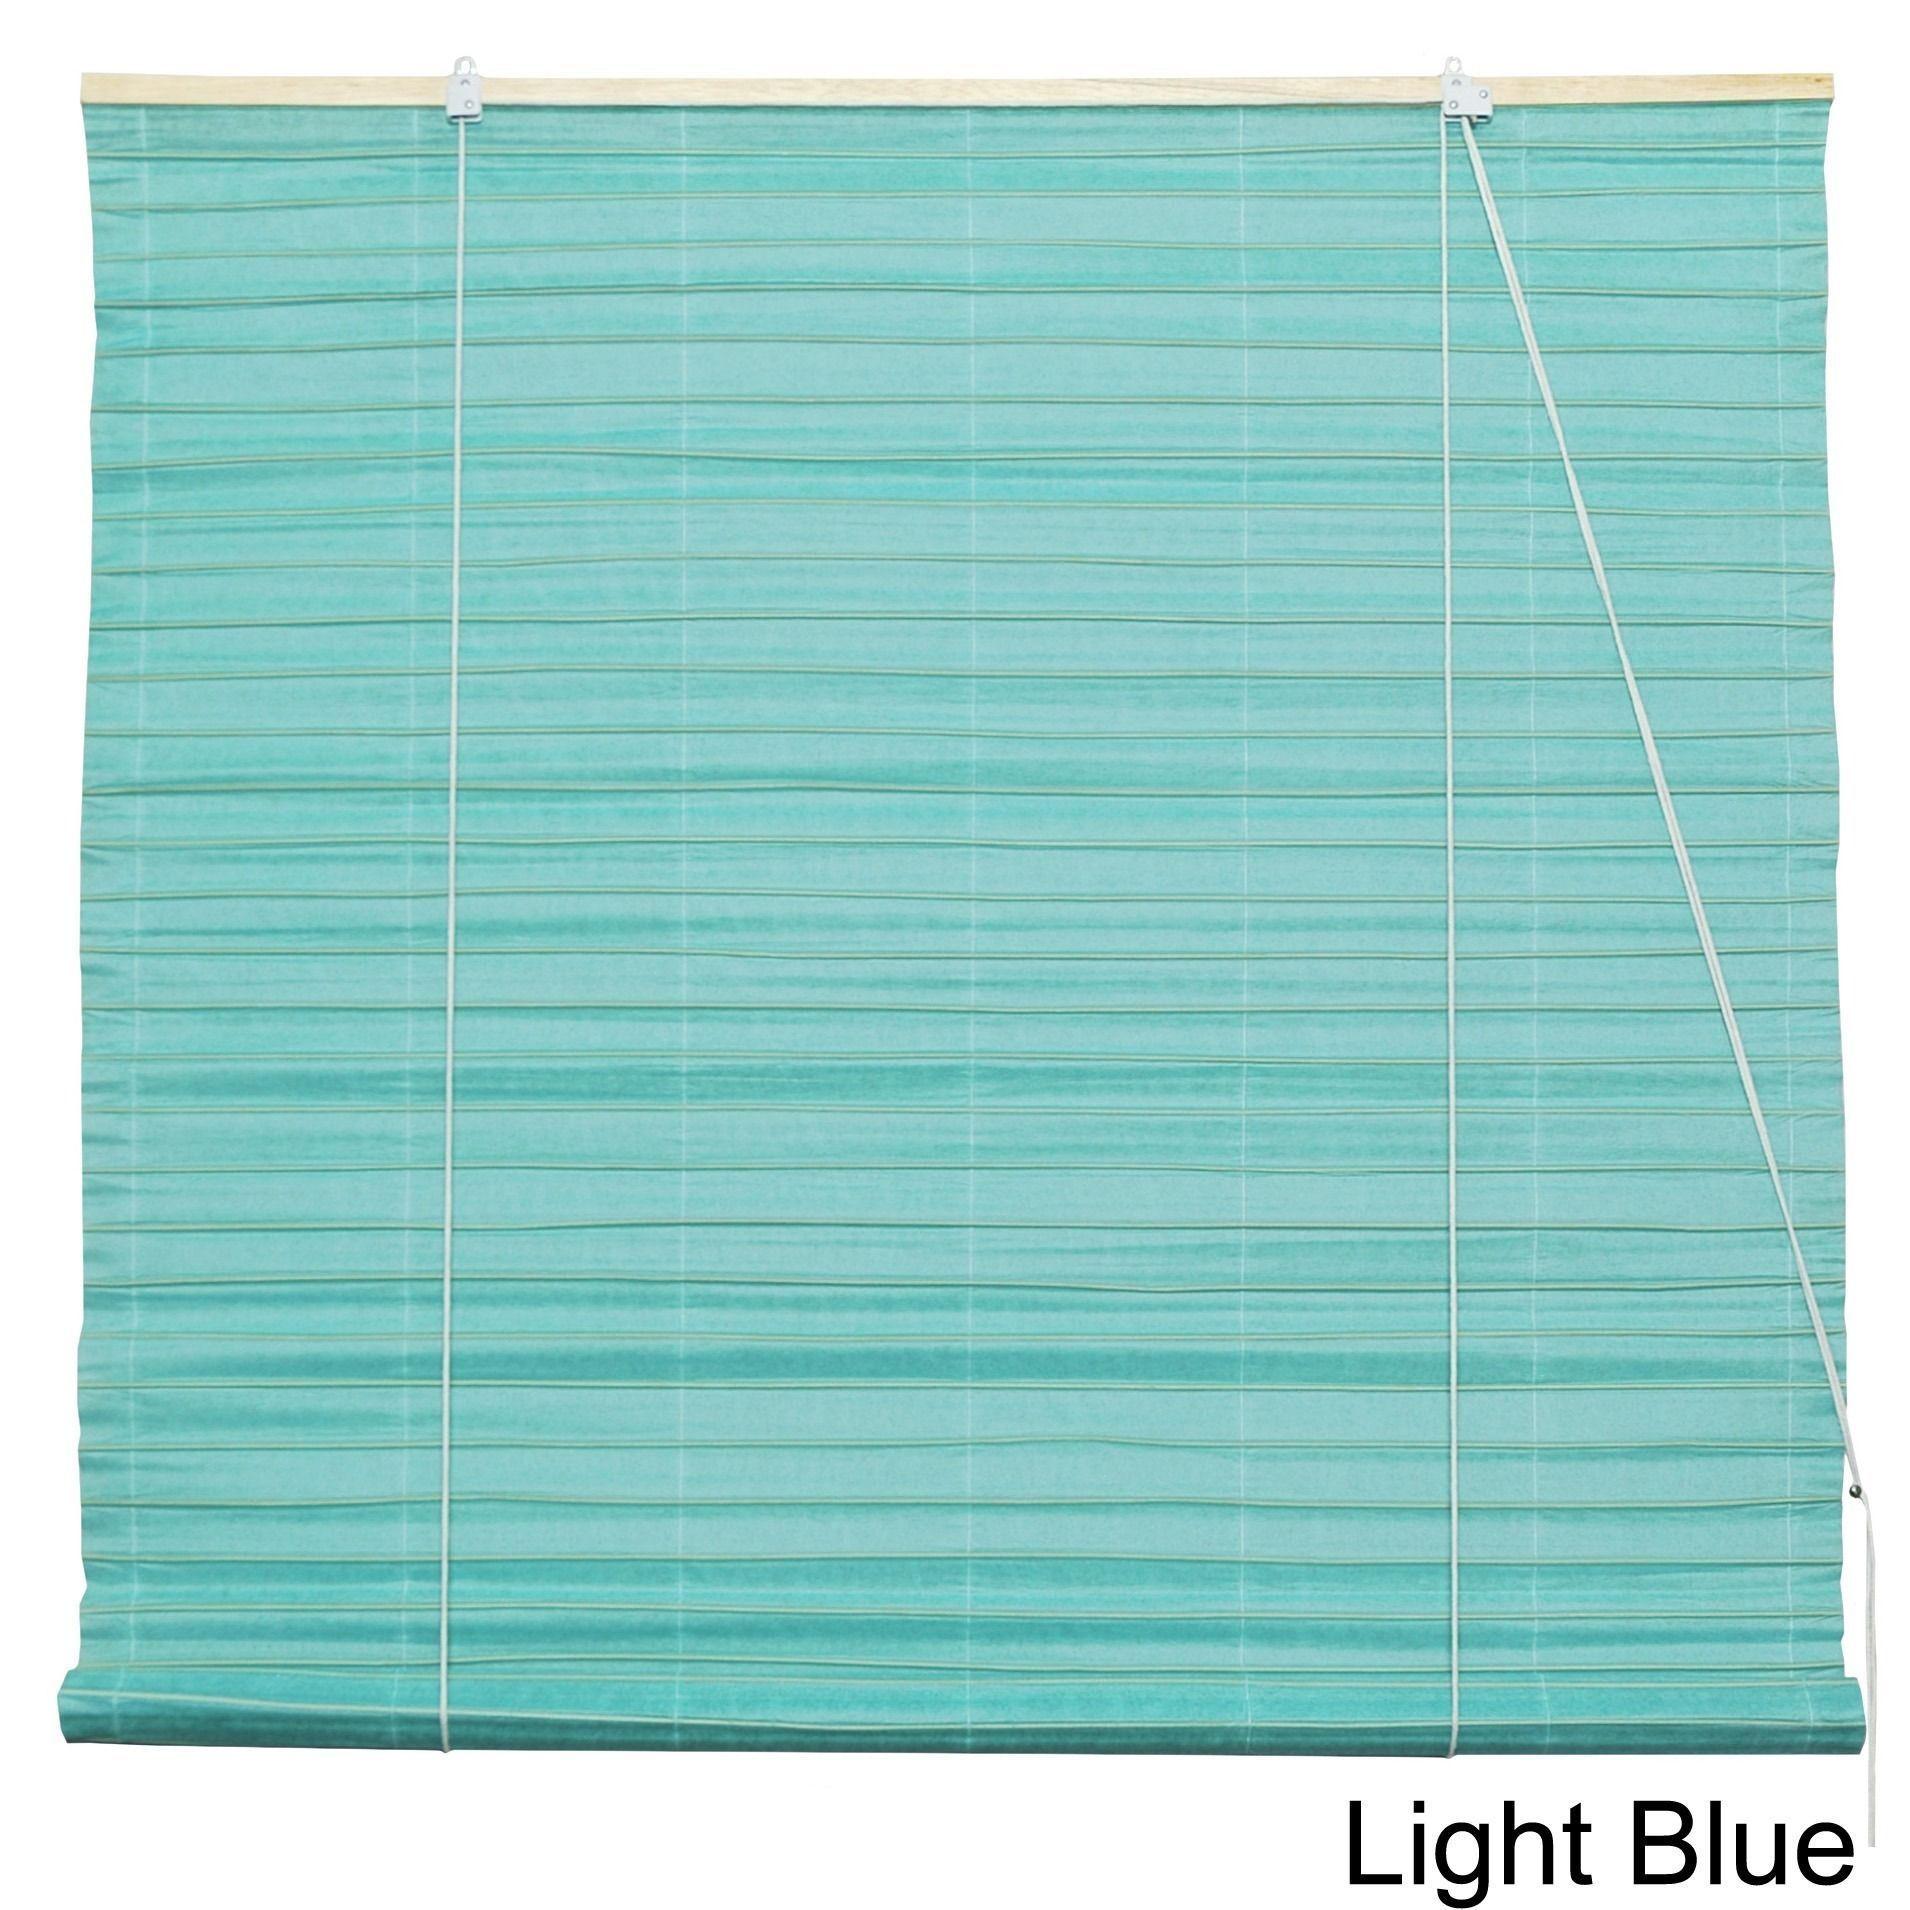 Handmade shoji paper inch rollup blinds china light blue